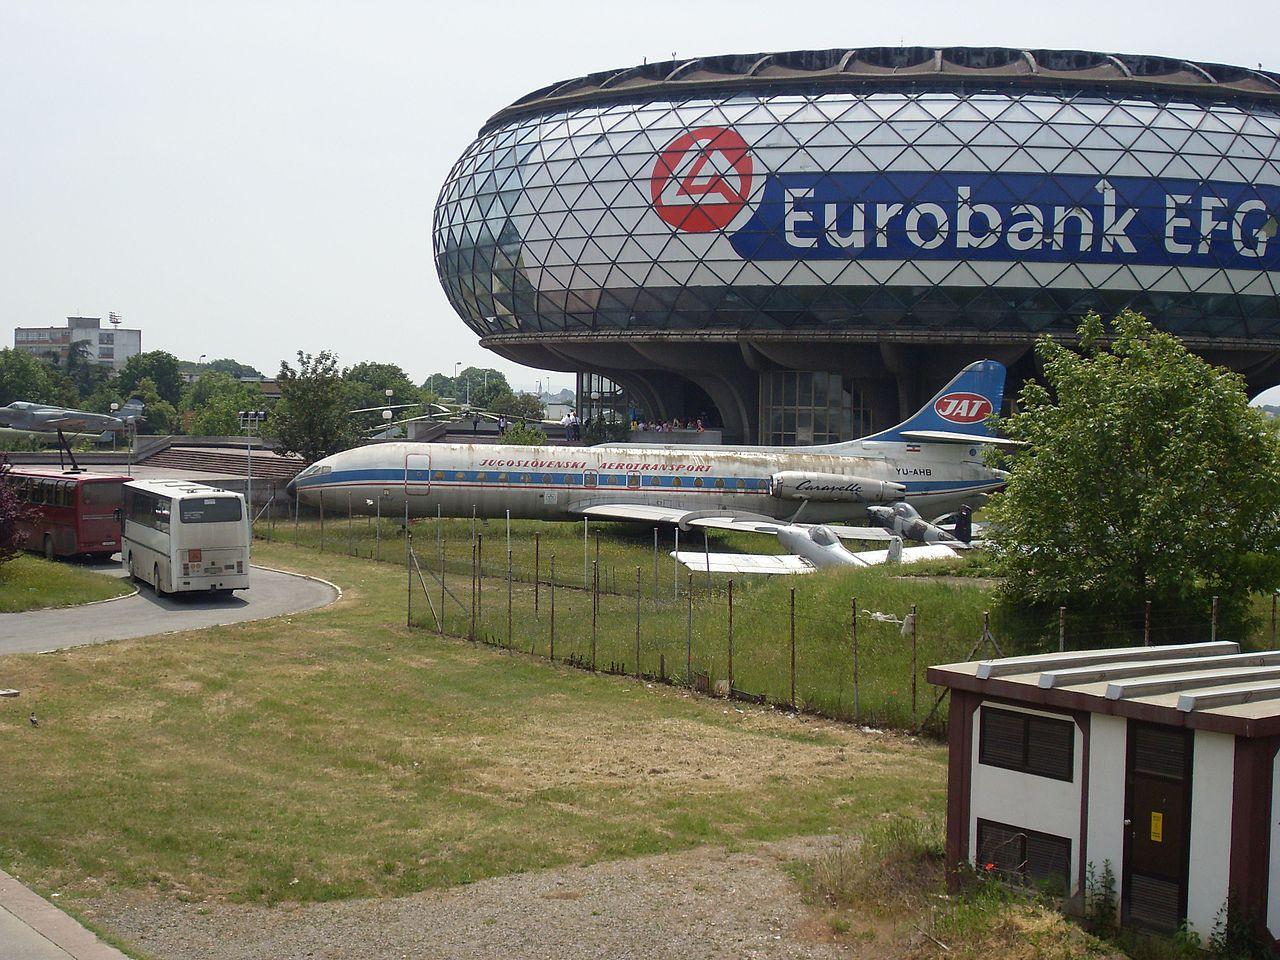 1280px-Luftfahrtmuseum_Belgrad